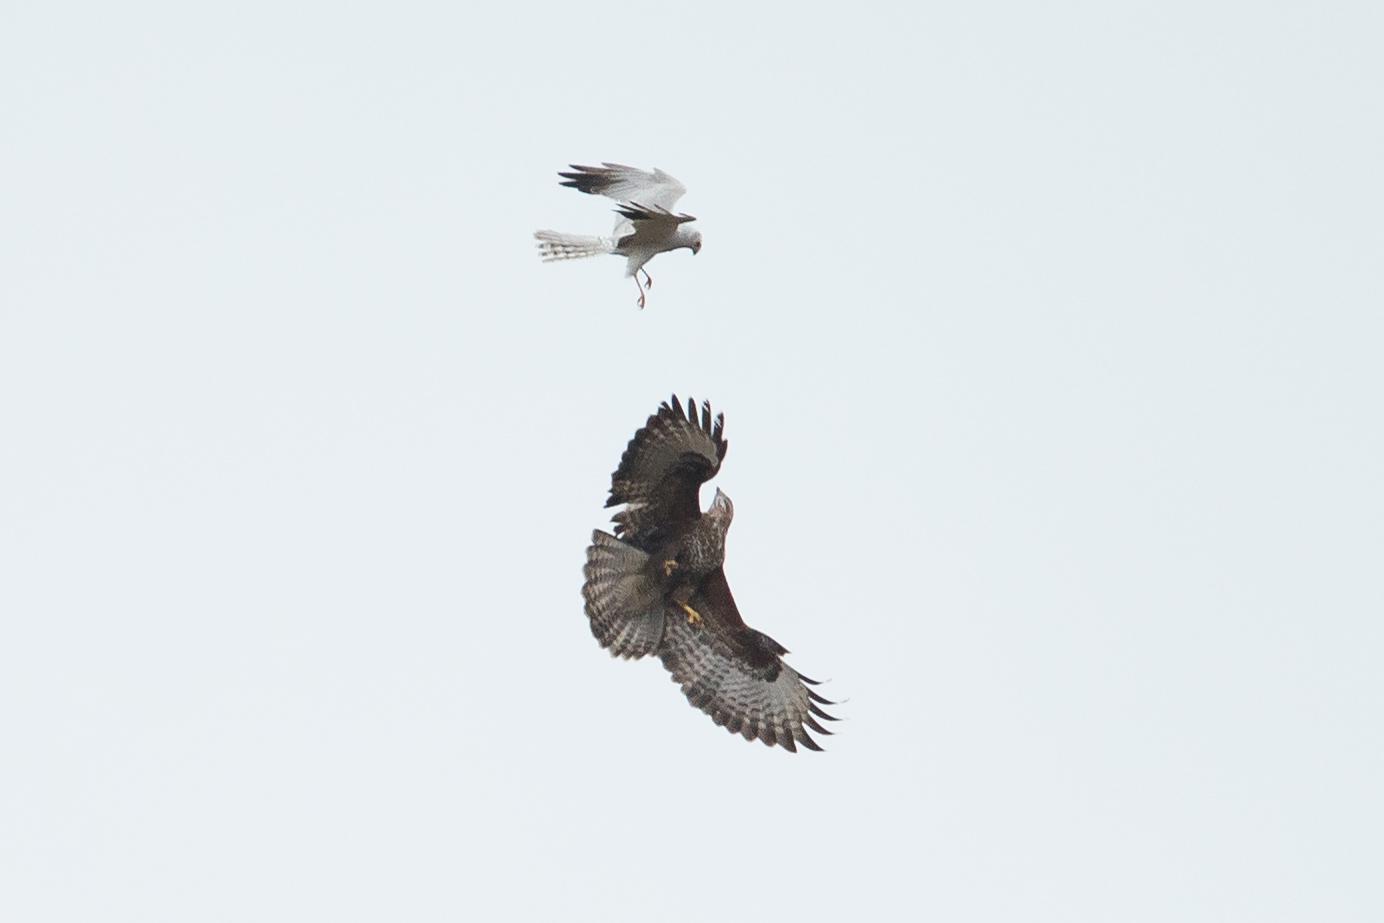 Pallid Harrier versus Common Buzzard. No contest!